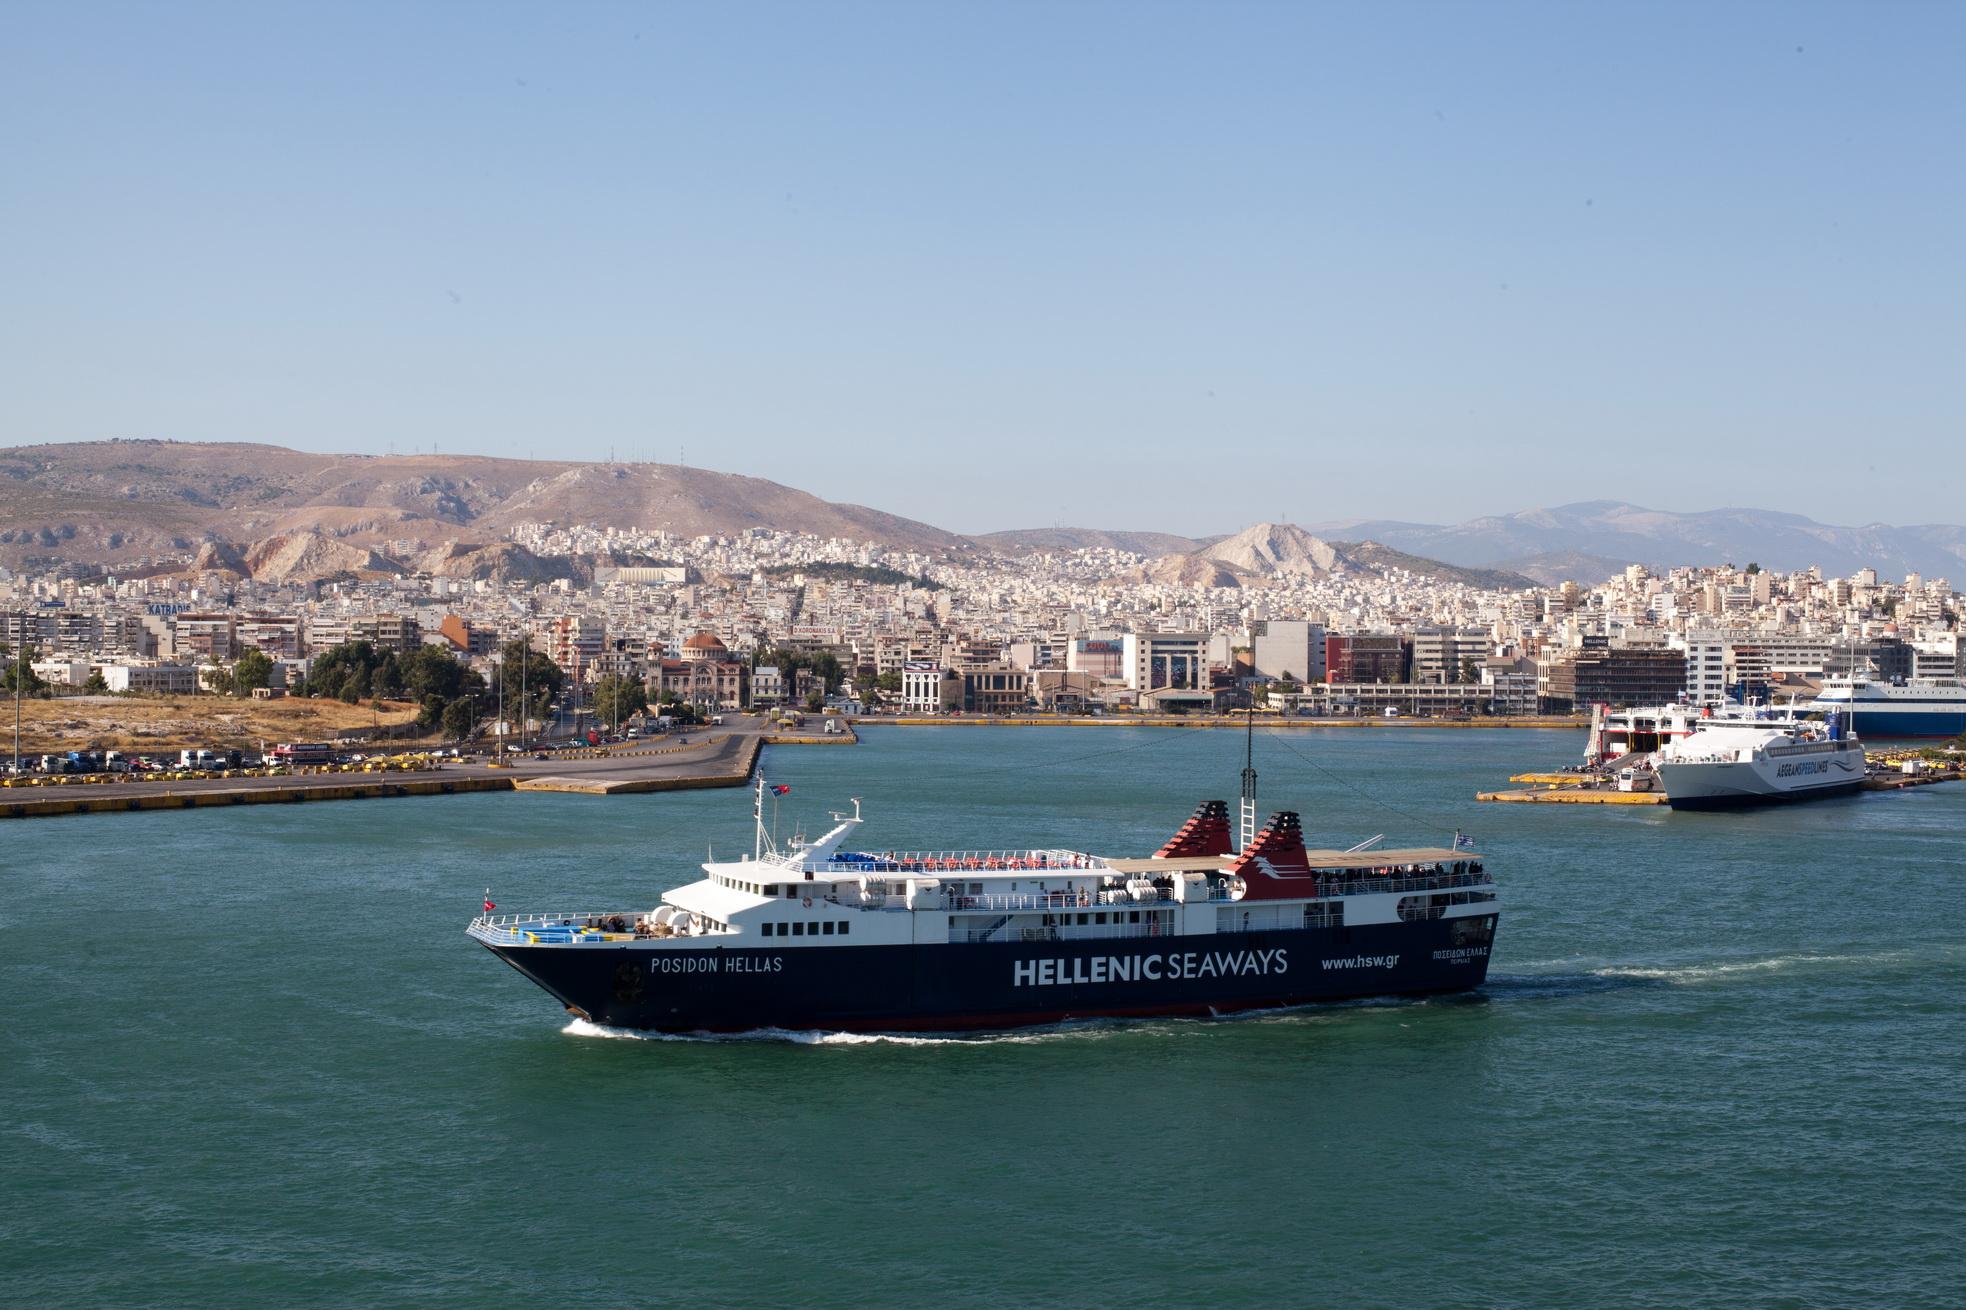 MS Posidon Hellas IMO 8966963 Hellenic Seaways Piraeus Port of Athens Greece 02